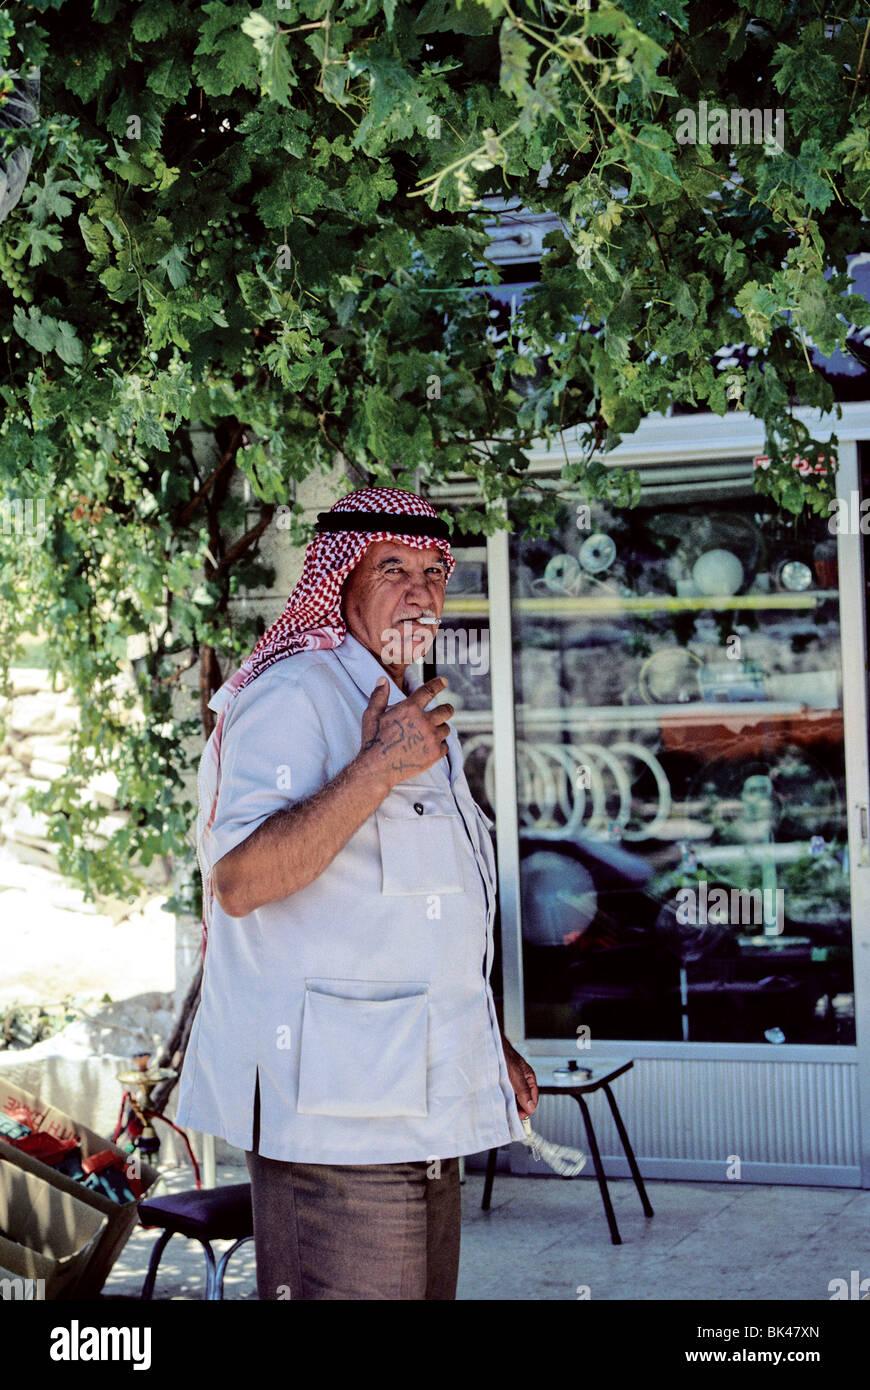 Portrait of a Jordanian man smoking a cigarette, Jordan - Stock Image